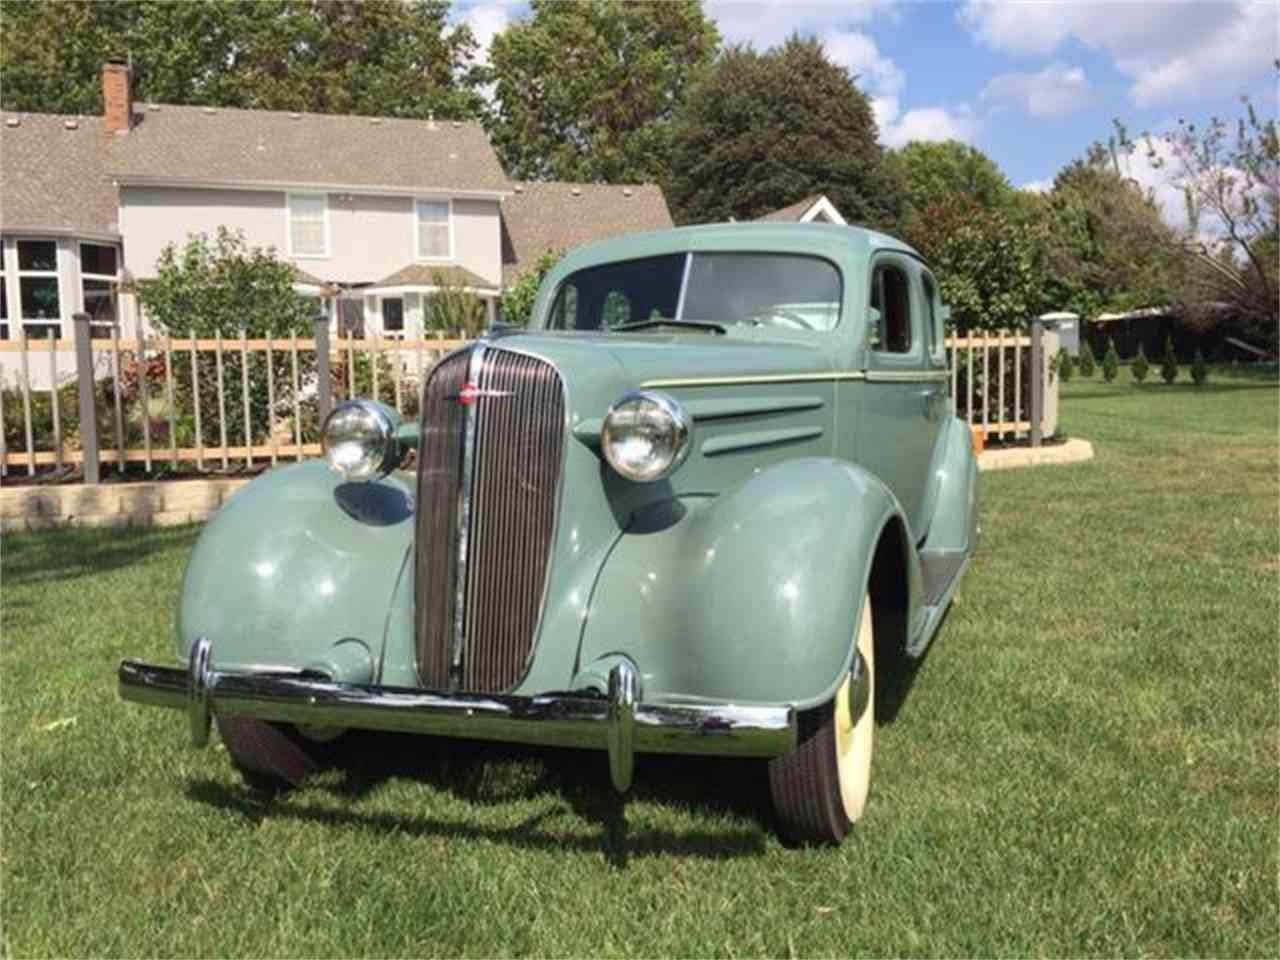 1936 Chevrolet Sedan for Sale | ClassicCars.com | CC-1028193